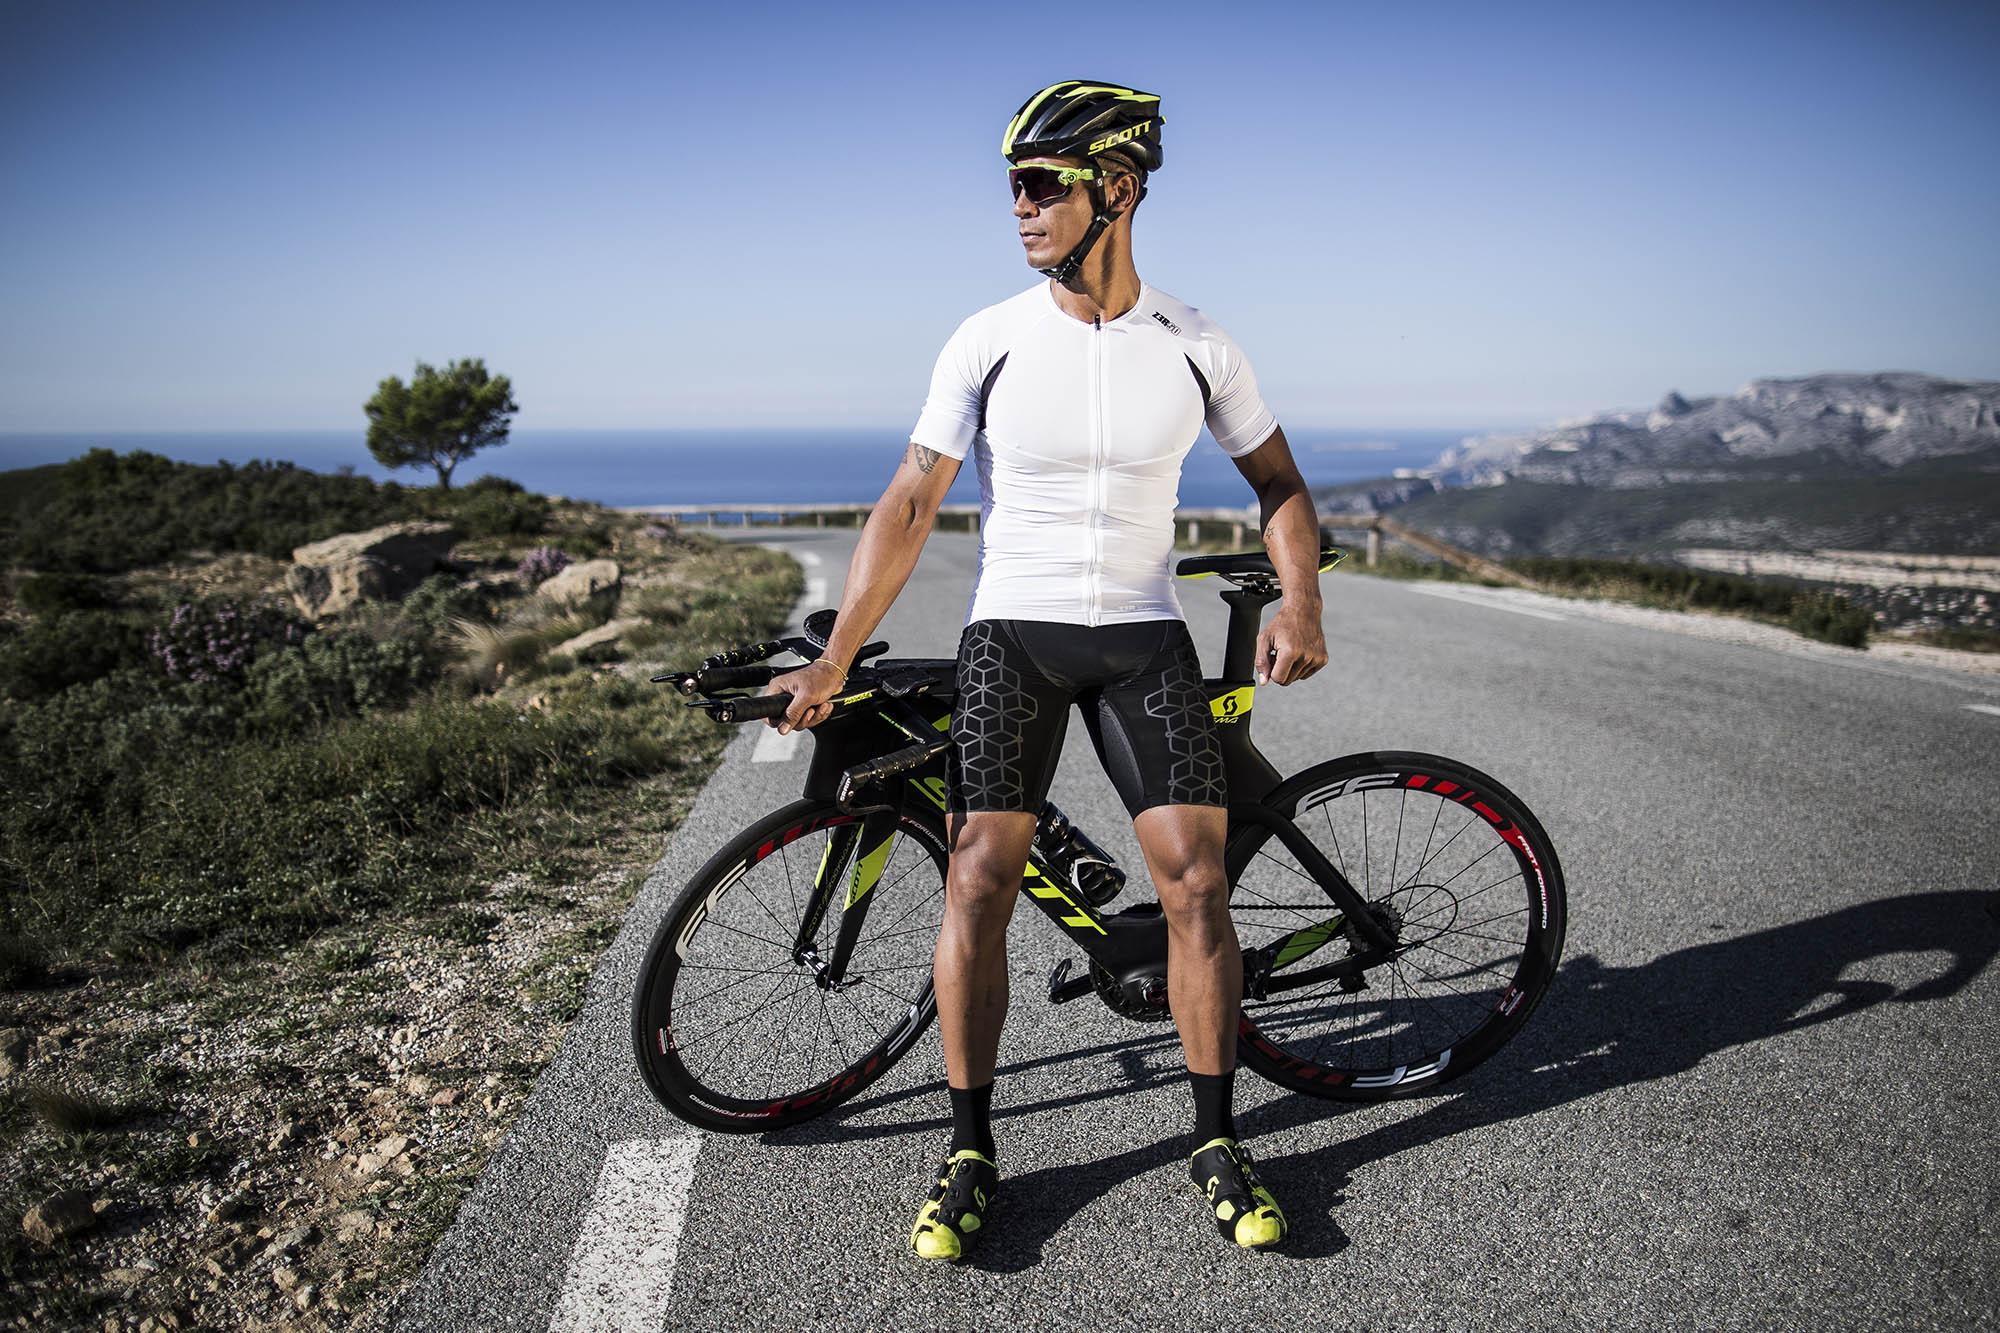 Triathlon - Men - Time Trial